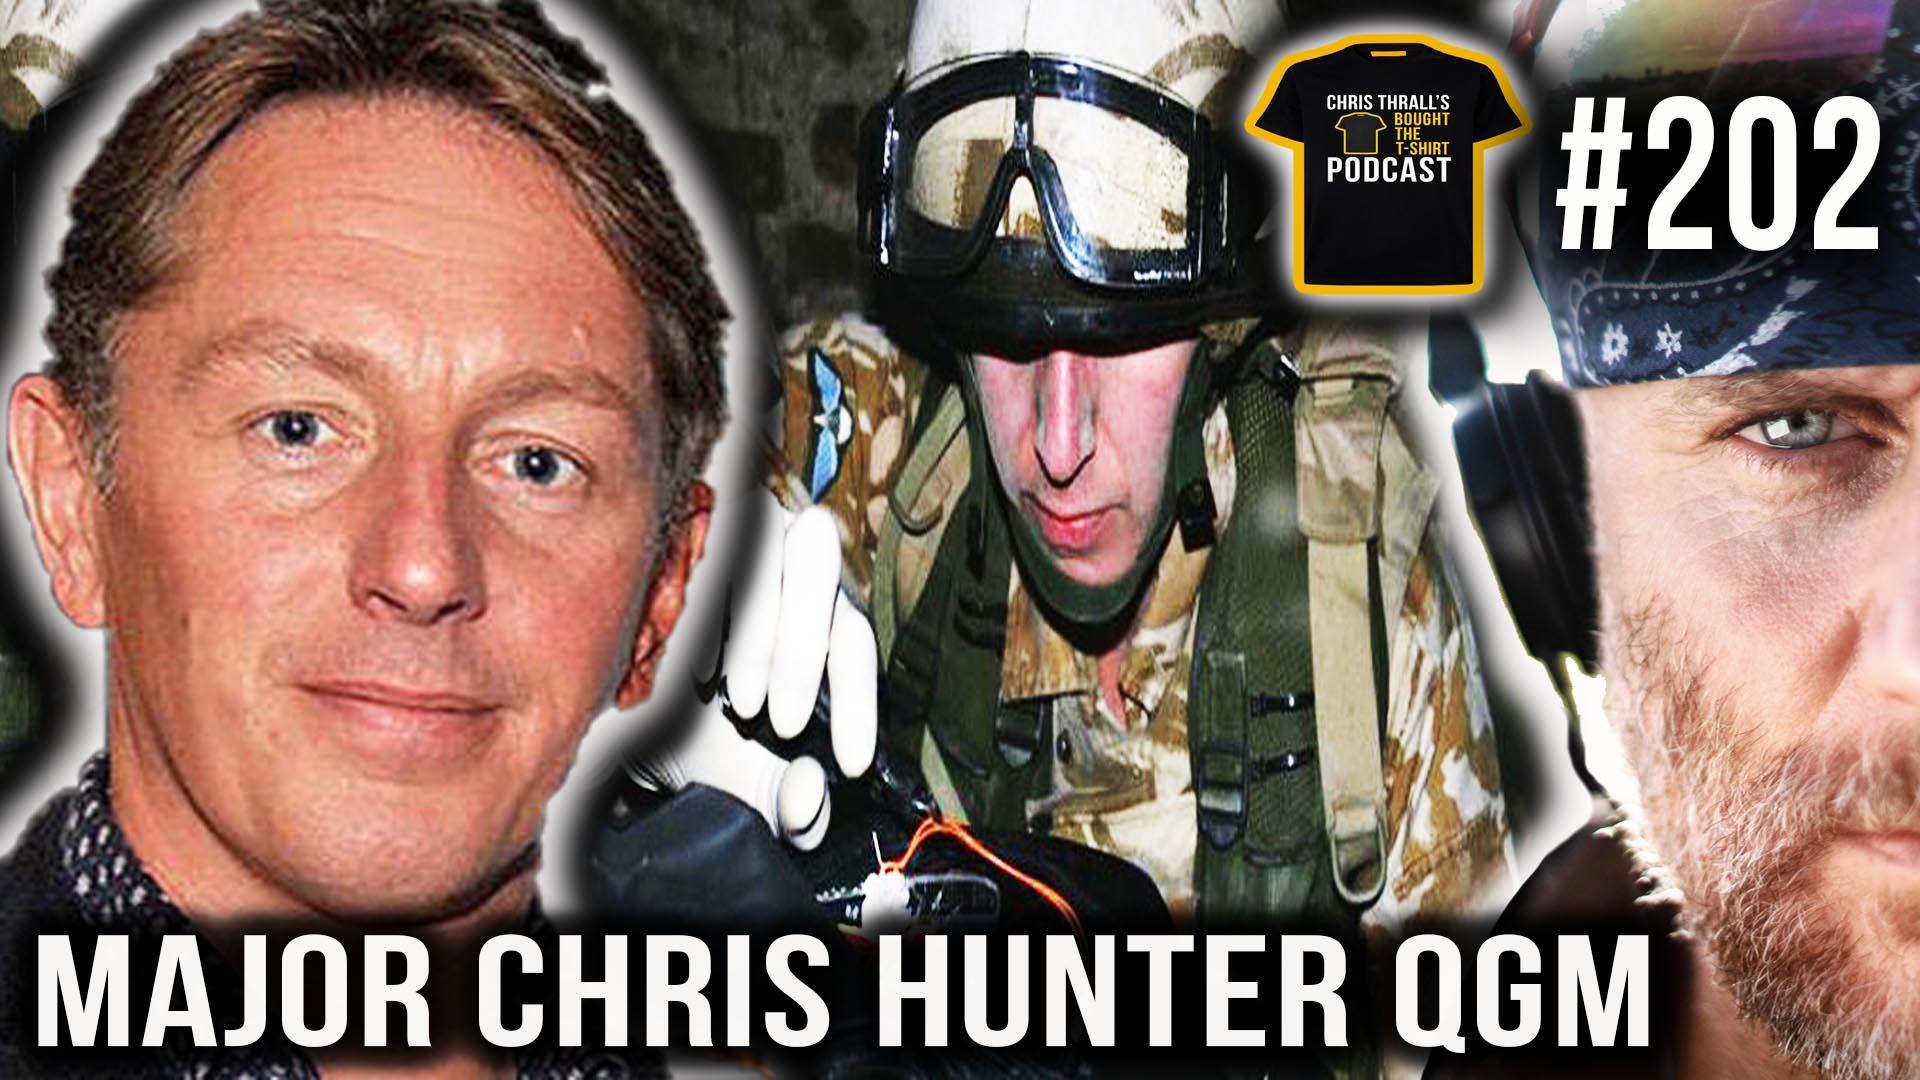 Beating The Bombmakers | Major Chris Hunter QGM | Podcast # 202